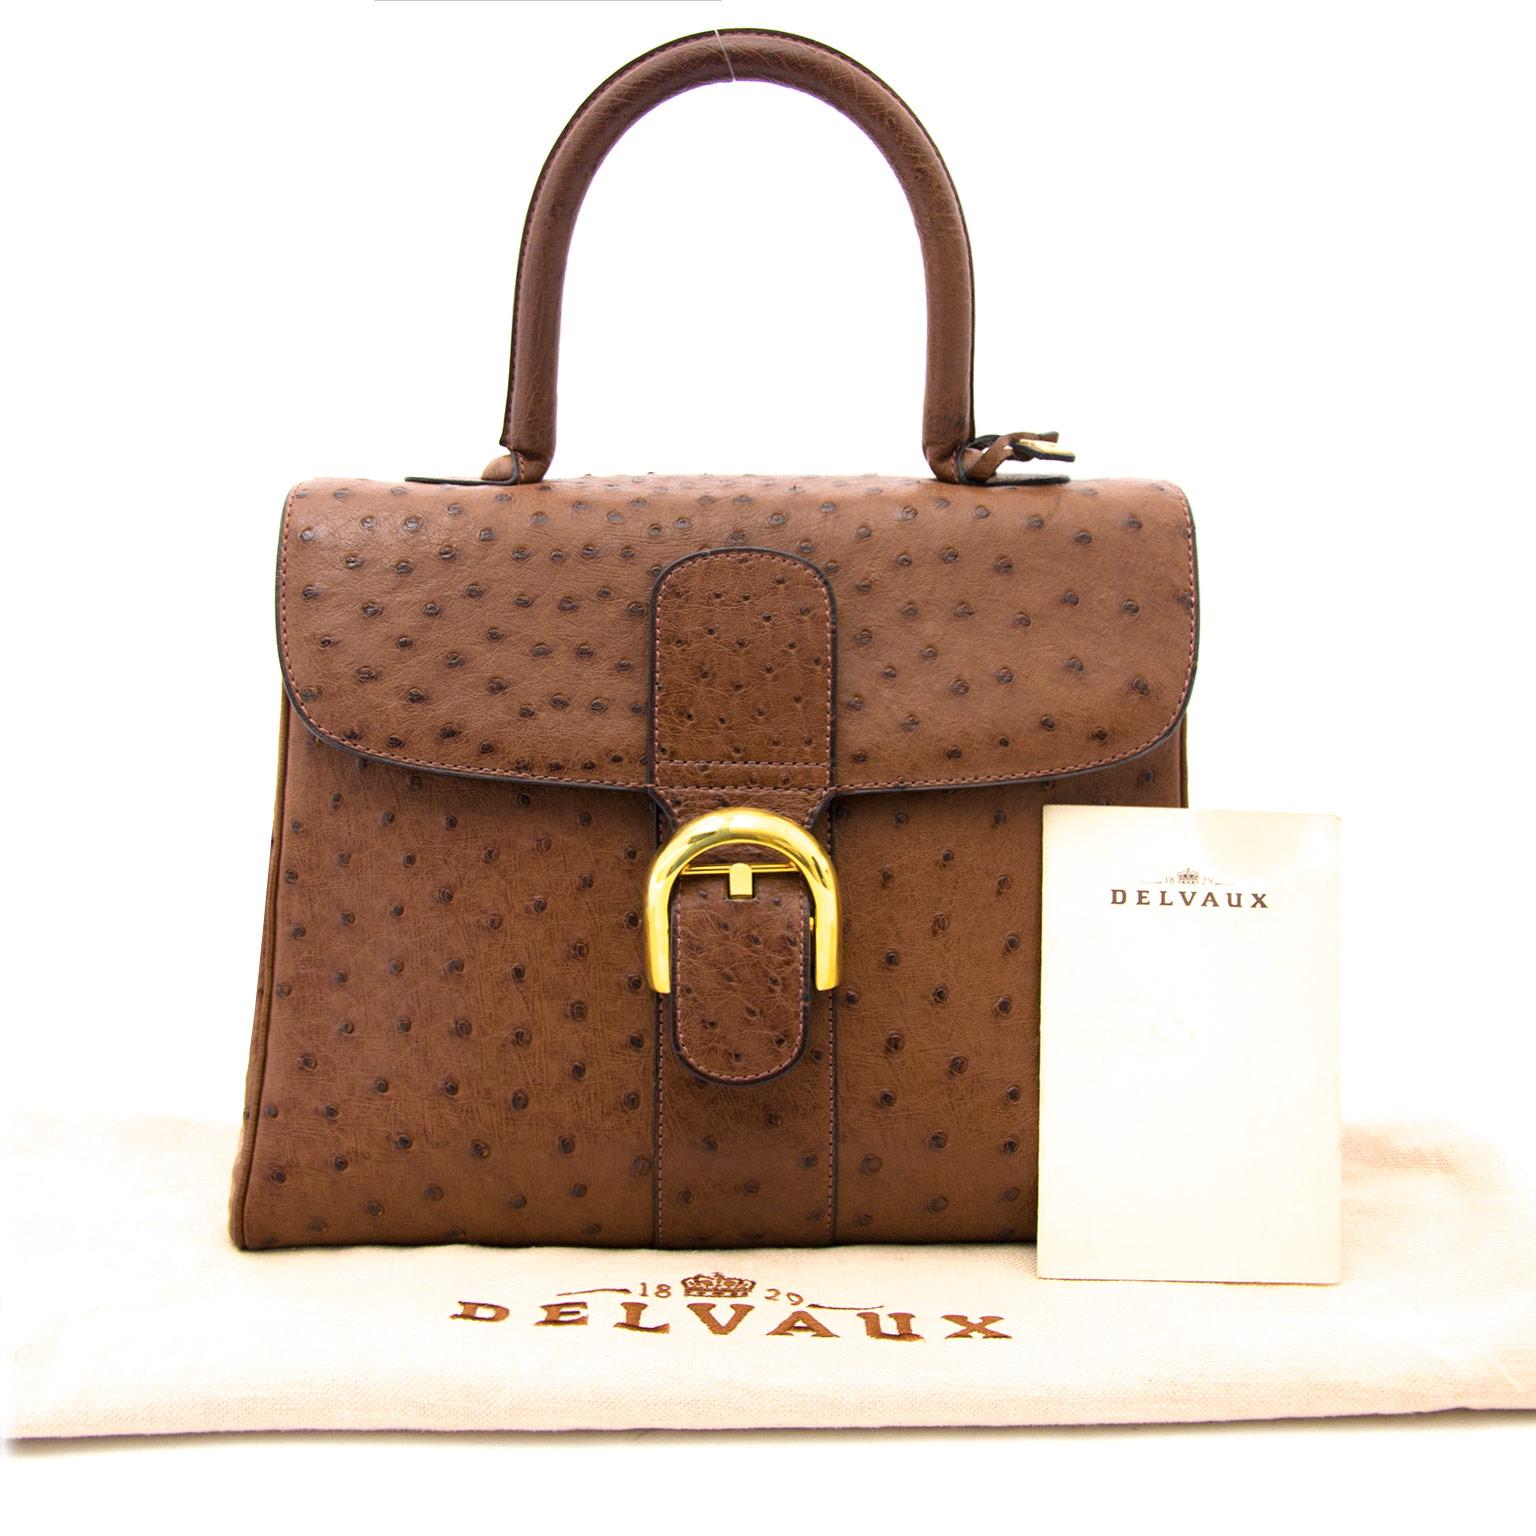 Acheter en ligne chez labellov.com Delvaux brillant mm Ostrich Tabac